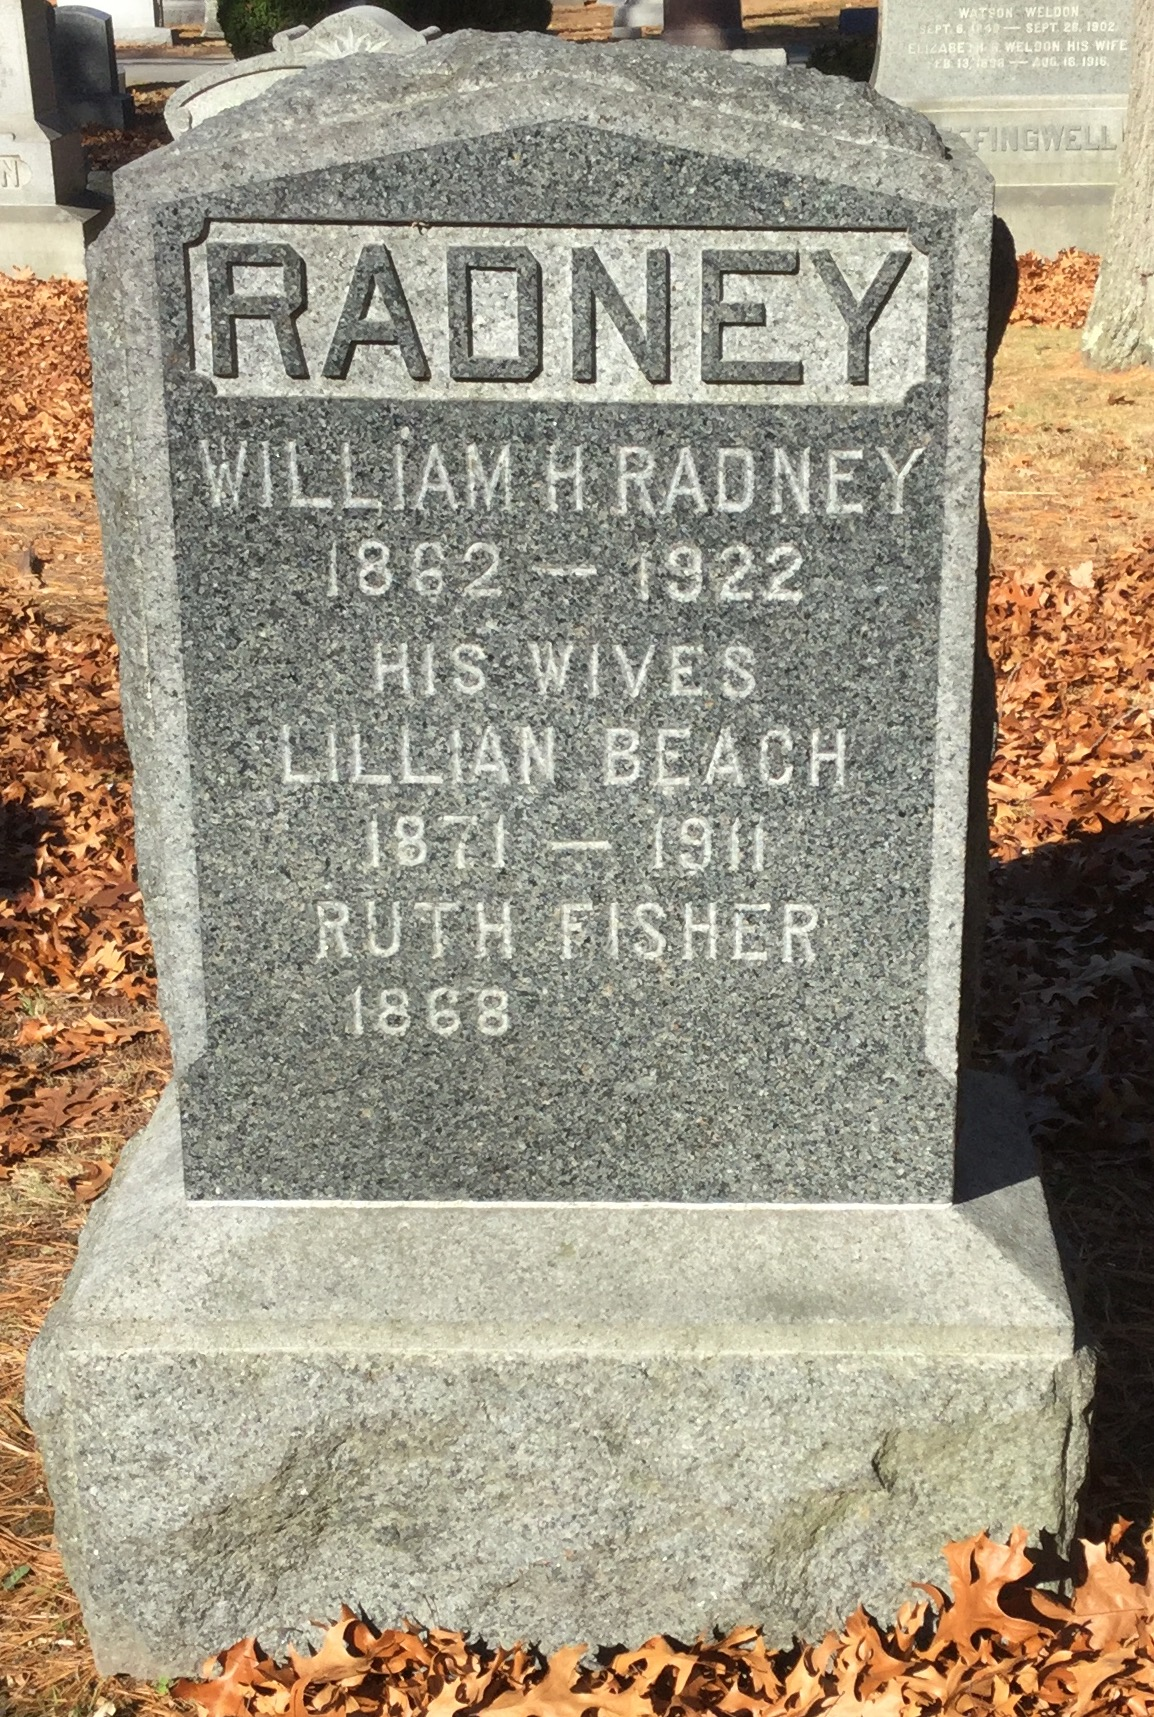 William Jackson Radney